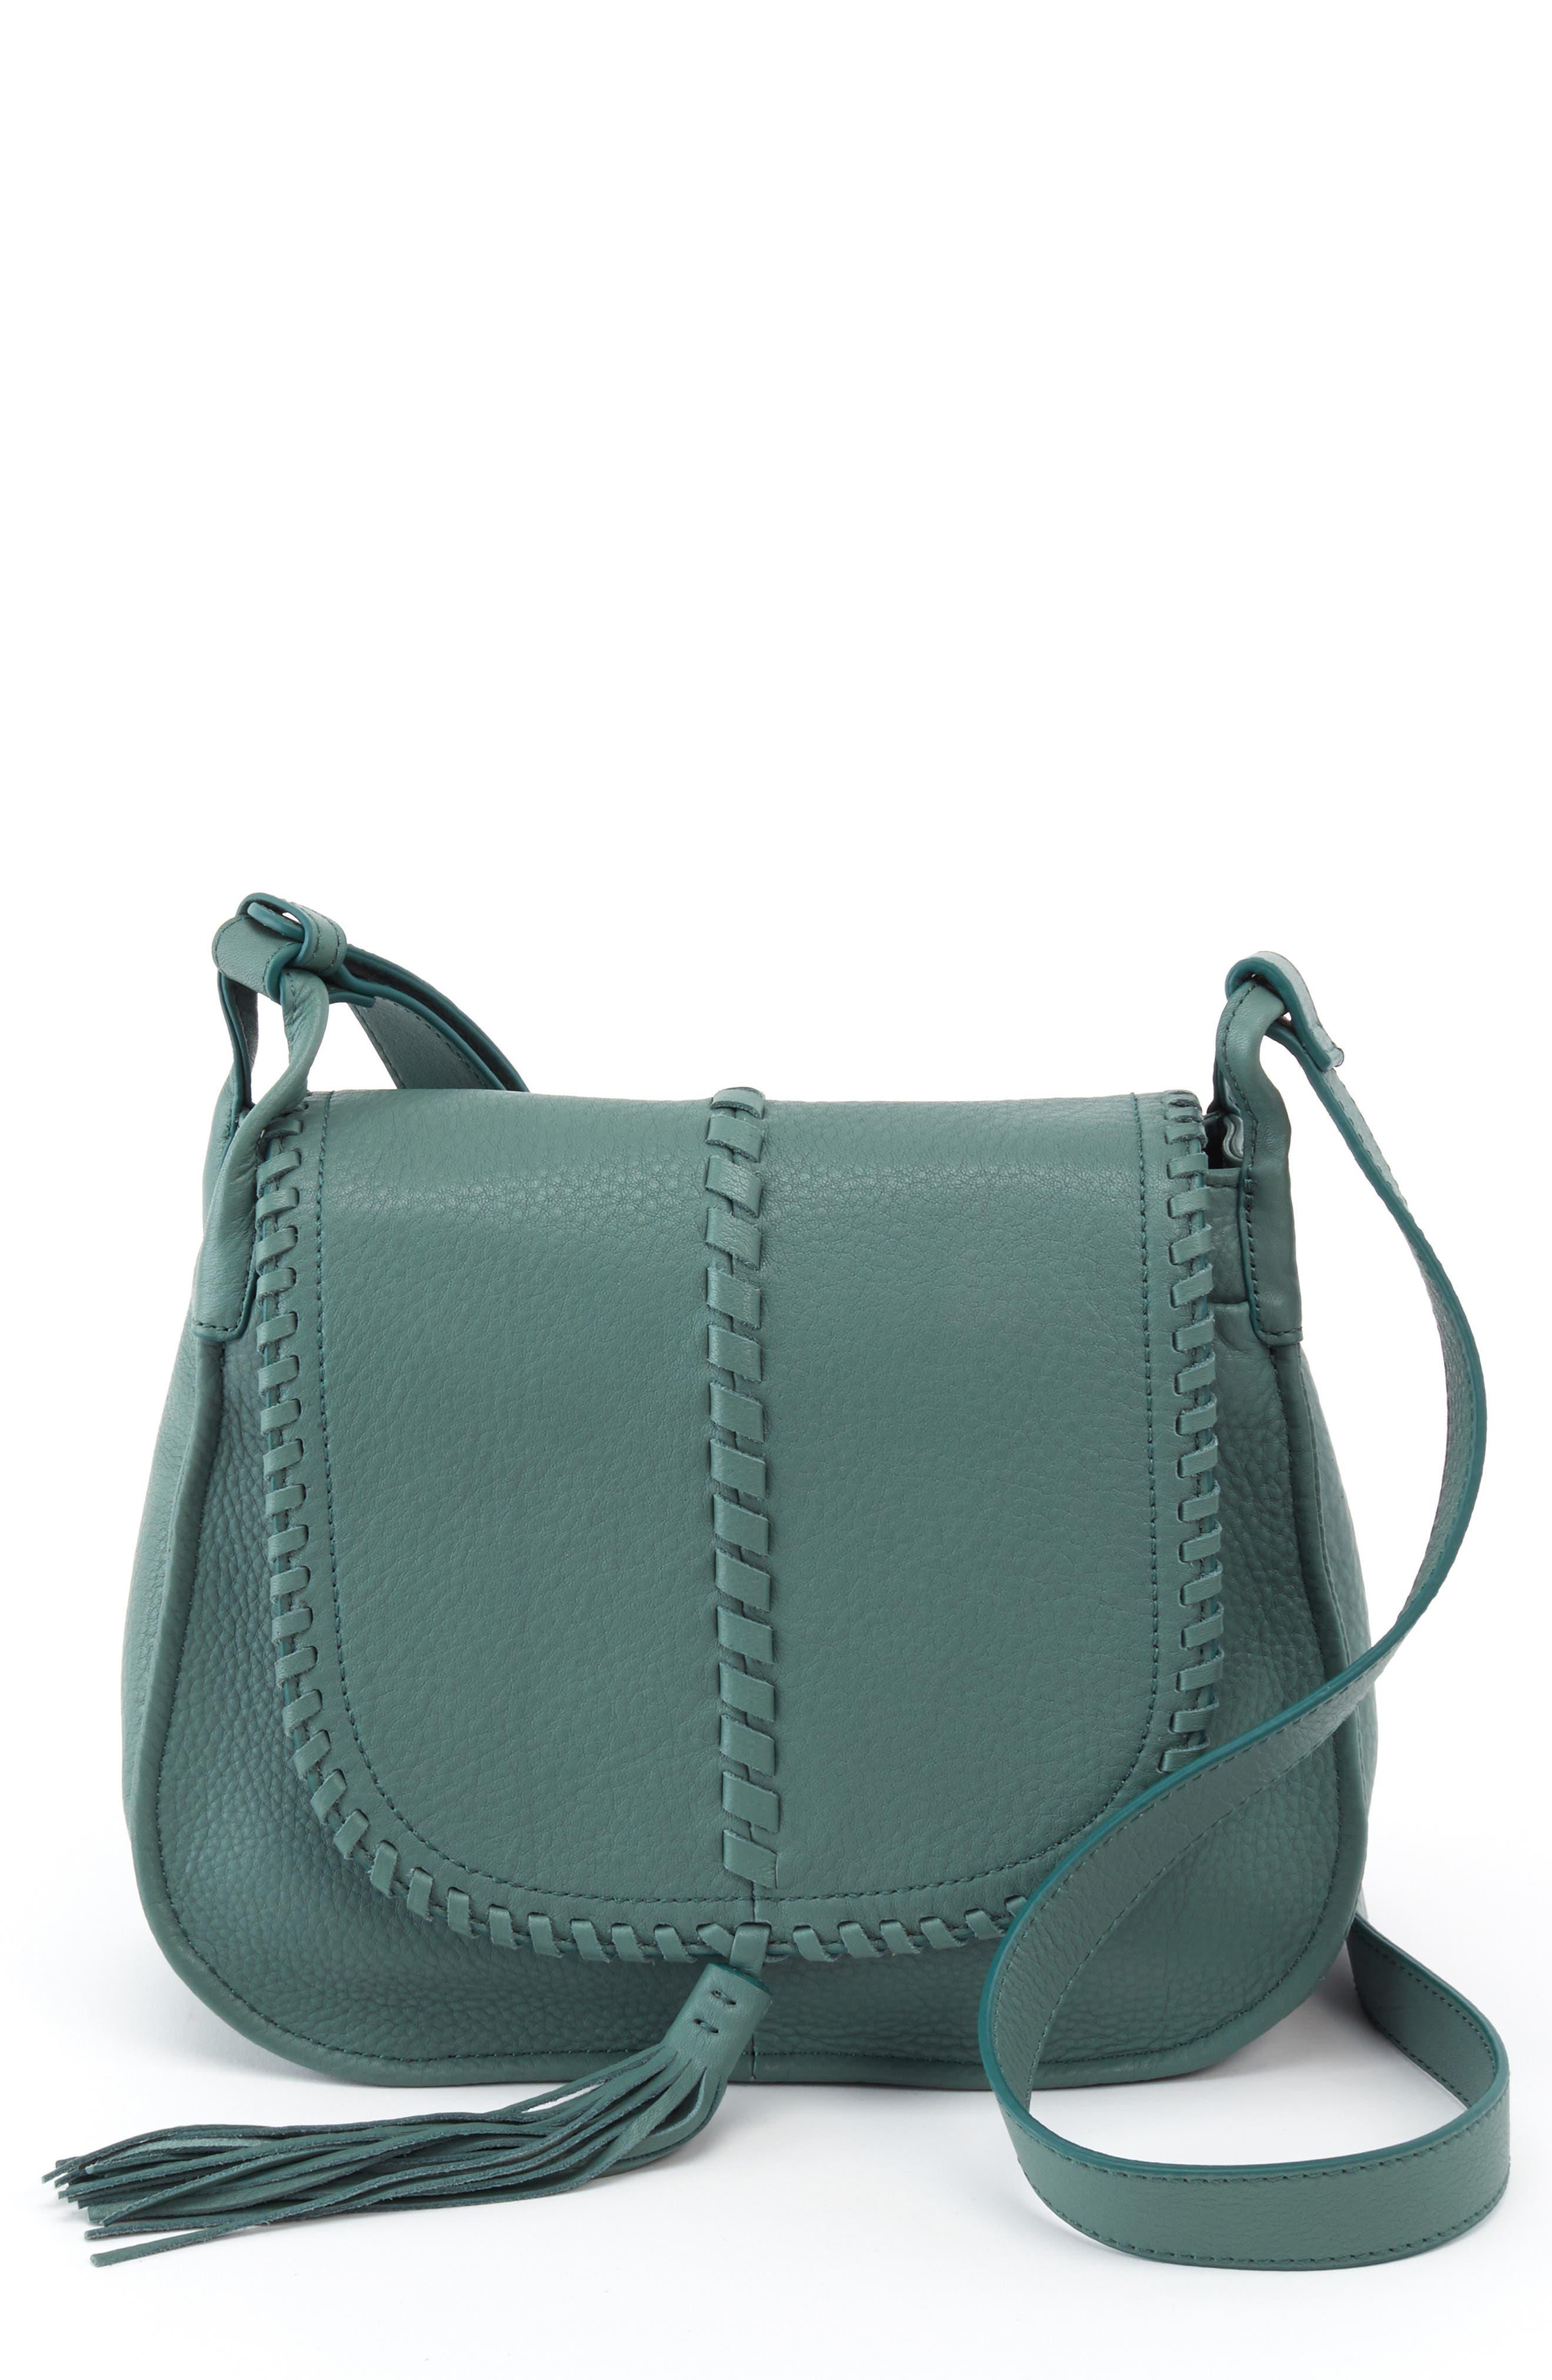 Brio Leather Crossbody Bag,                             Main thumbnail 1, color,                             MEADOW